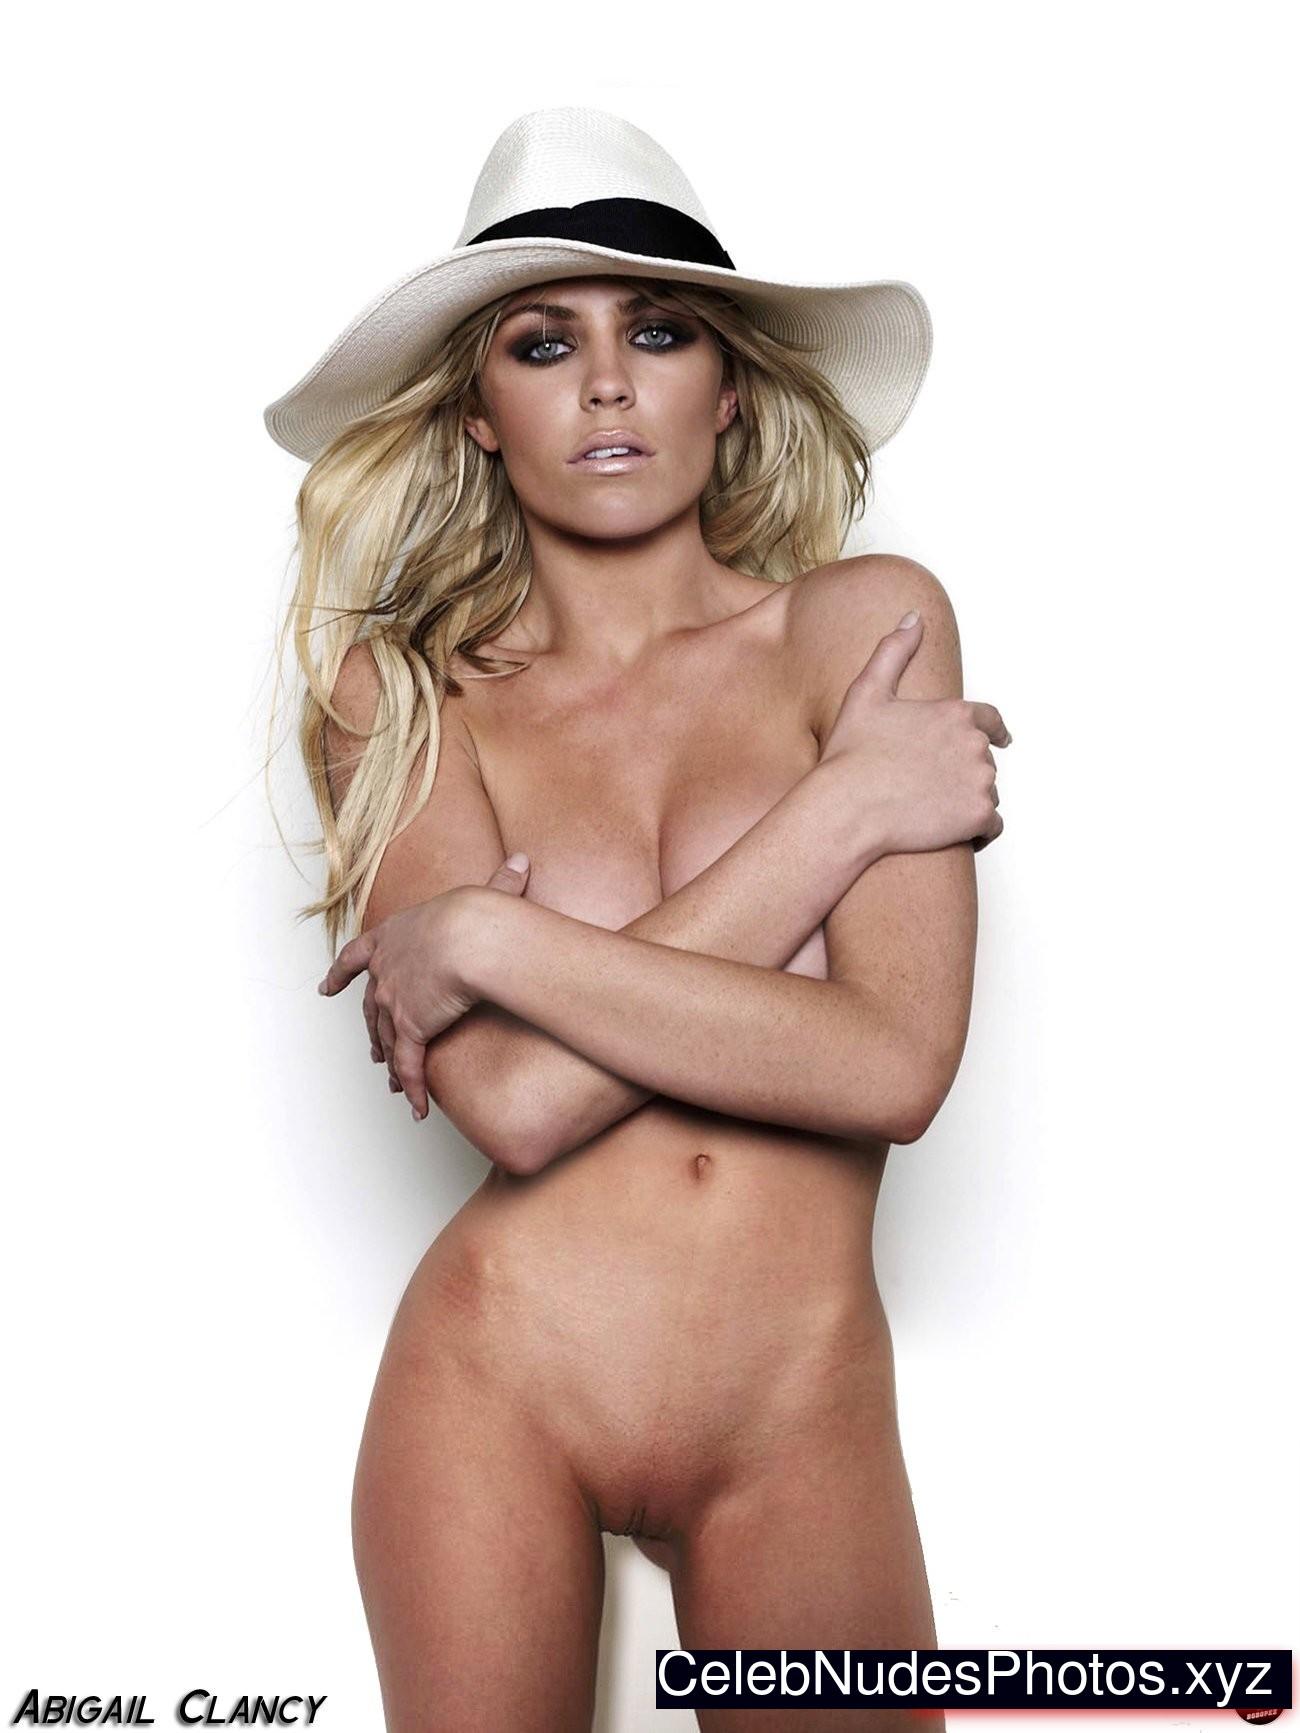 Abbey Clancy nude celeb pics